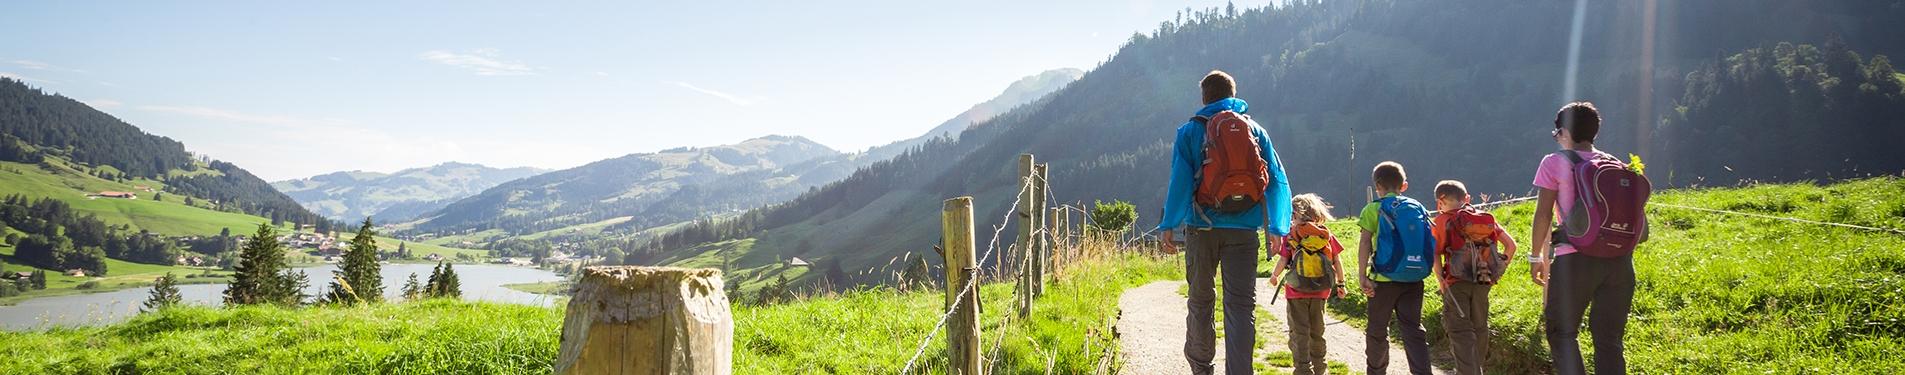 Randonnée à Schwarzsee